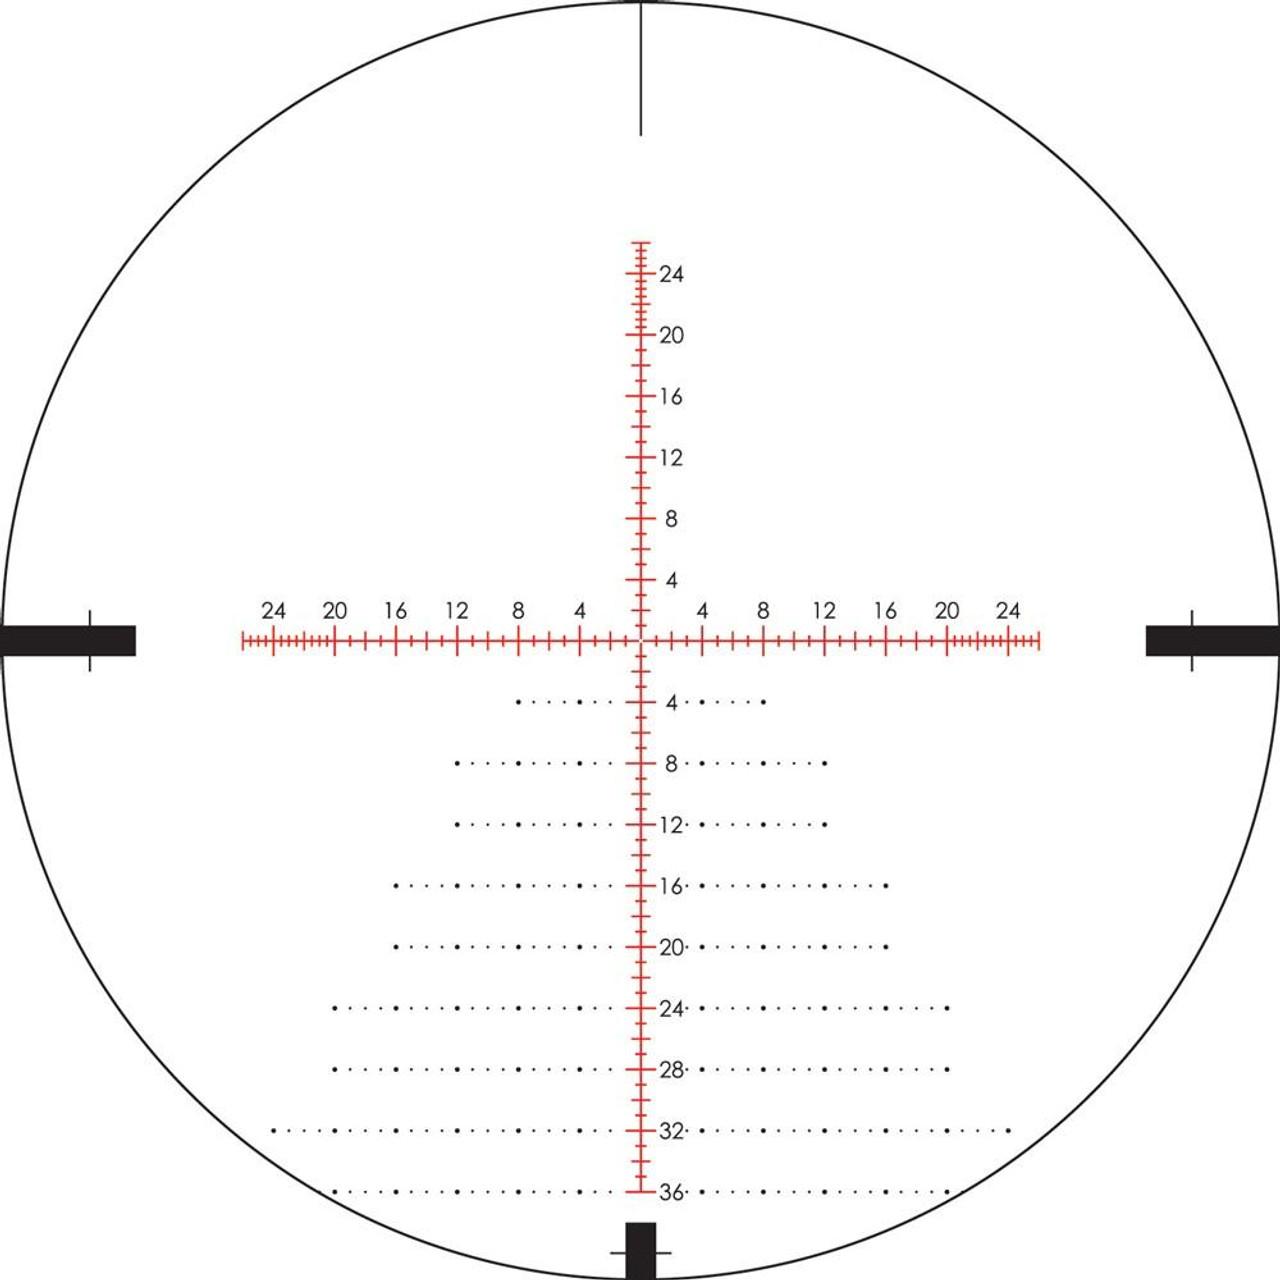 Vortex Viper PST 5-25x50 FFP Riflescope with EBR-2C MOA